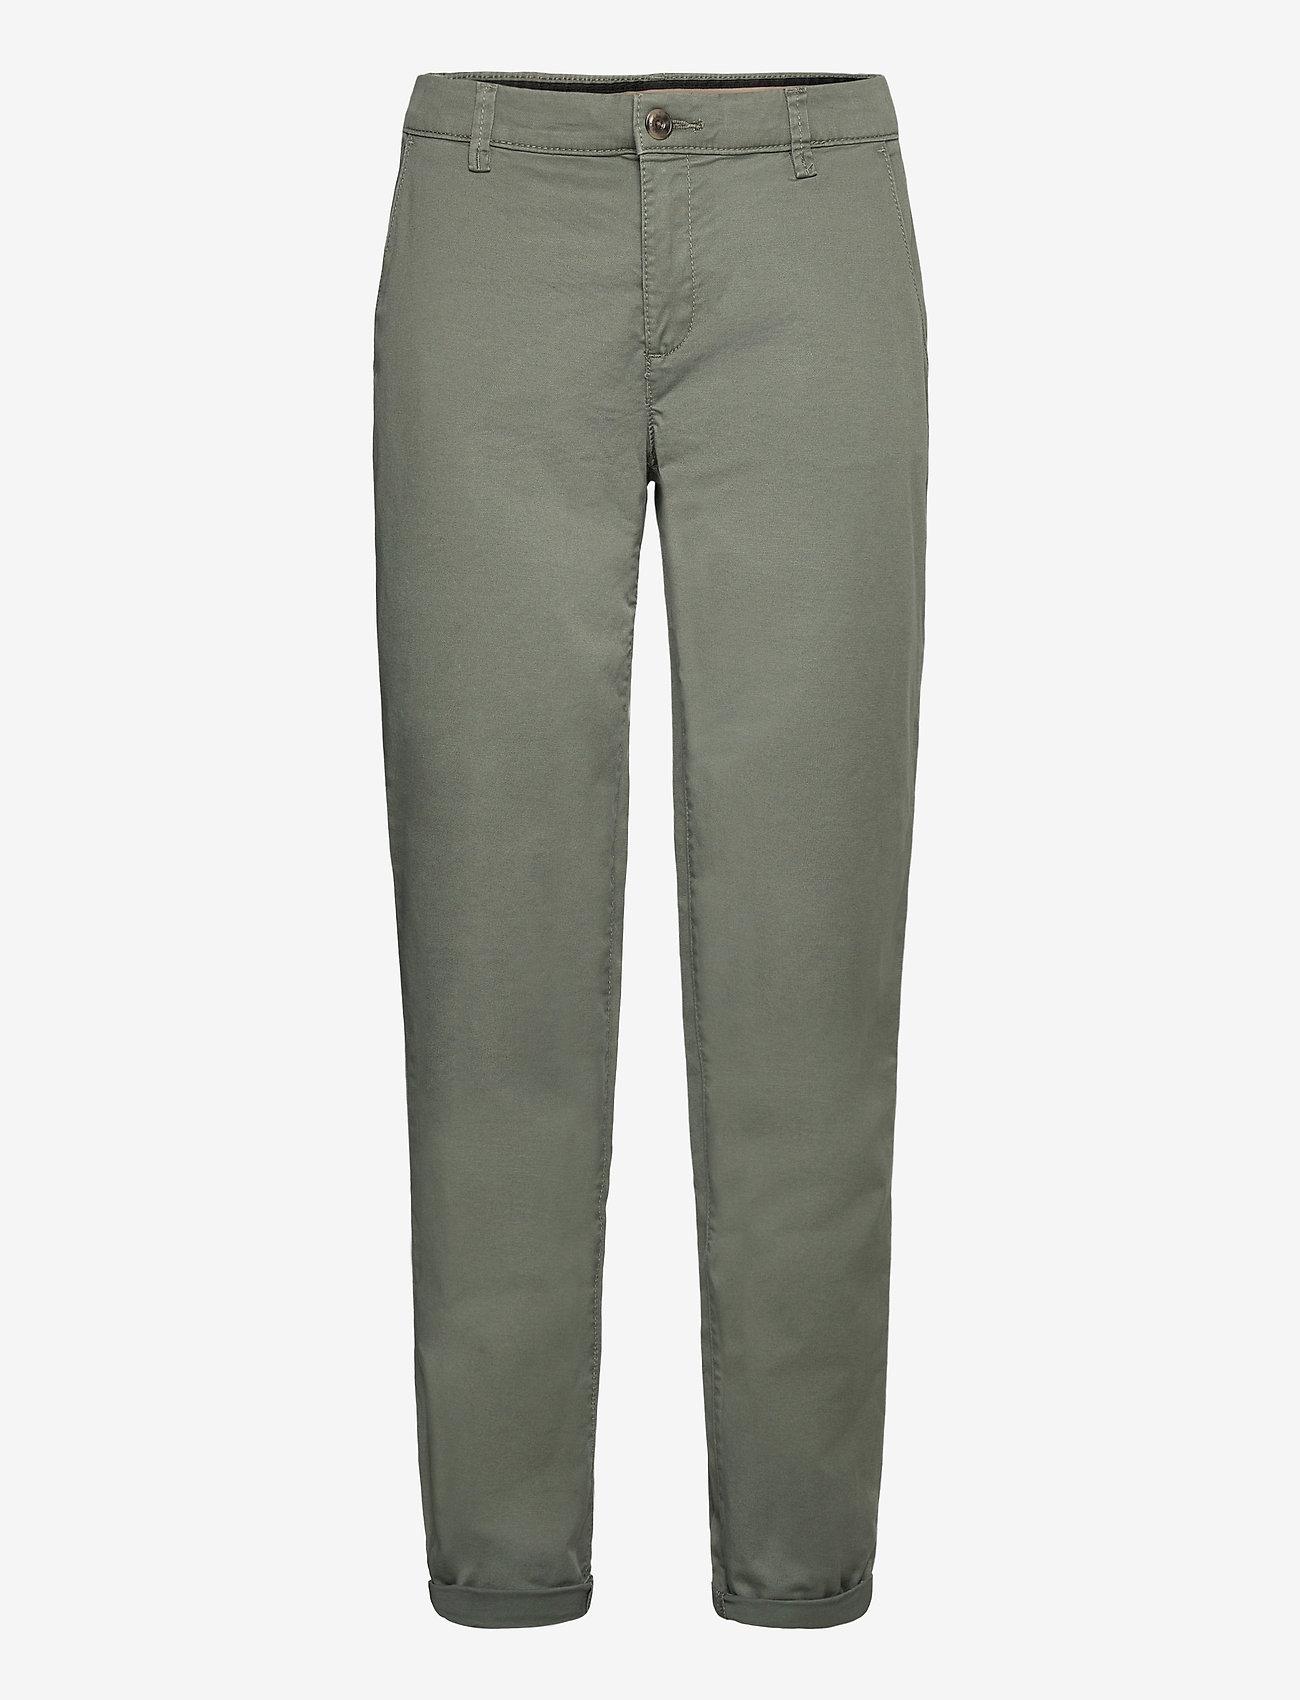 Esprit Casual - Pants woven - chinos - khaki green - 0